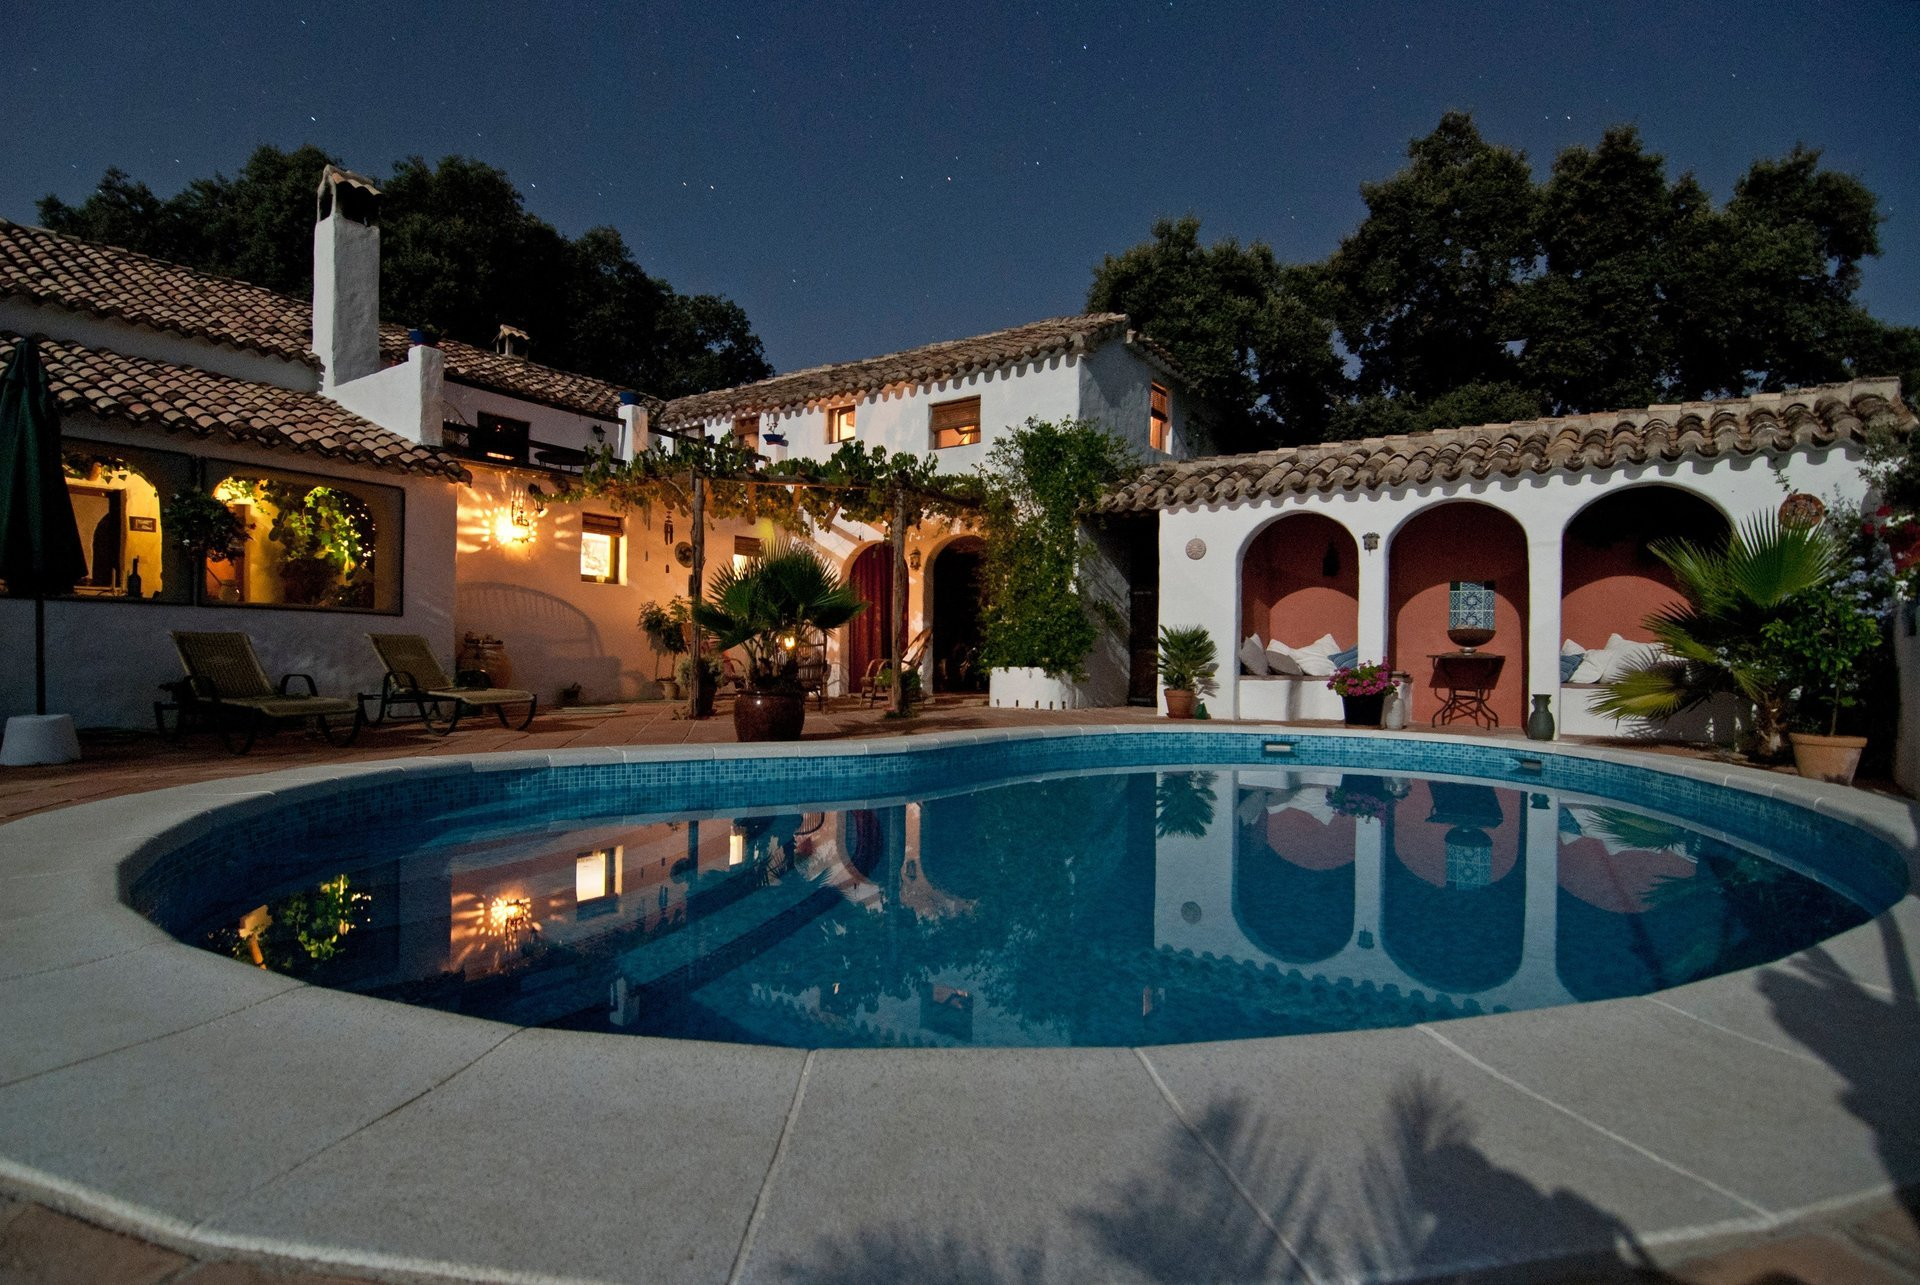 Swimming Pool By Vita Vilcina on unsplash.com for Sundollar Pool Builder's blog post